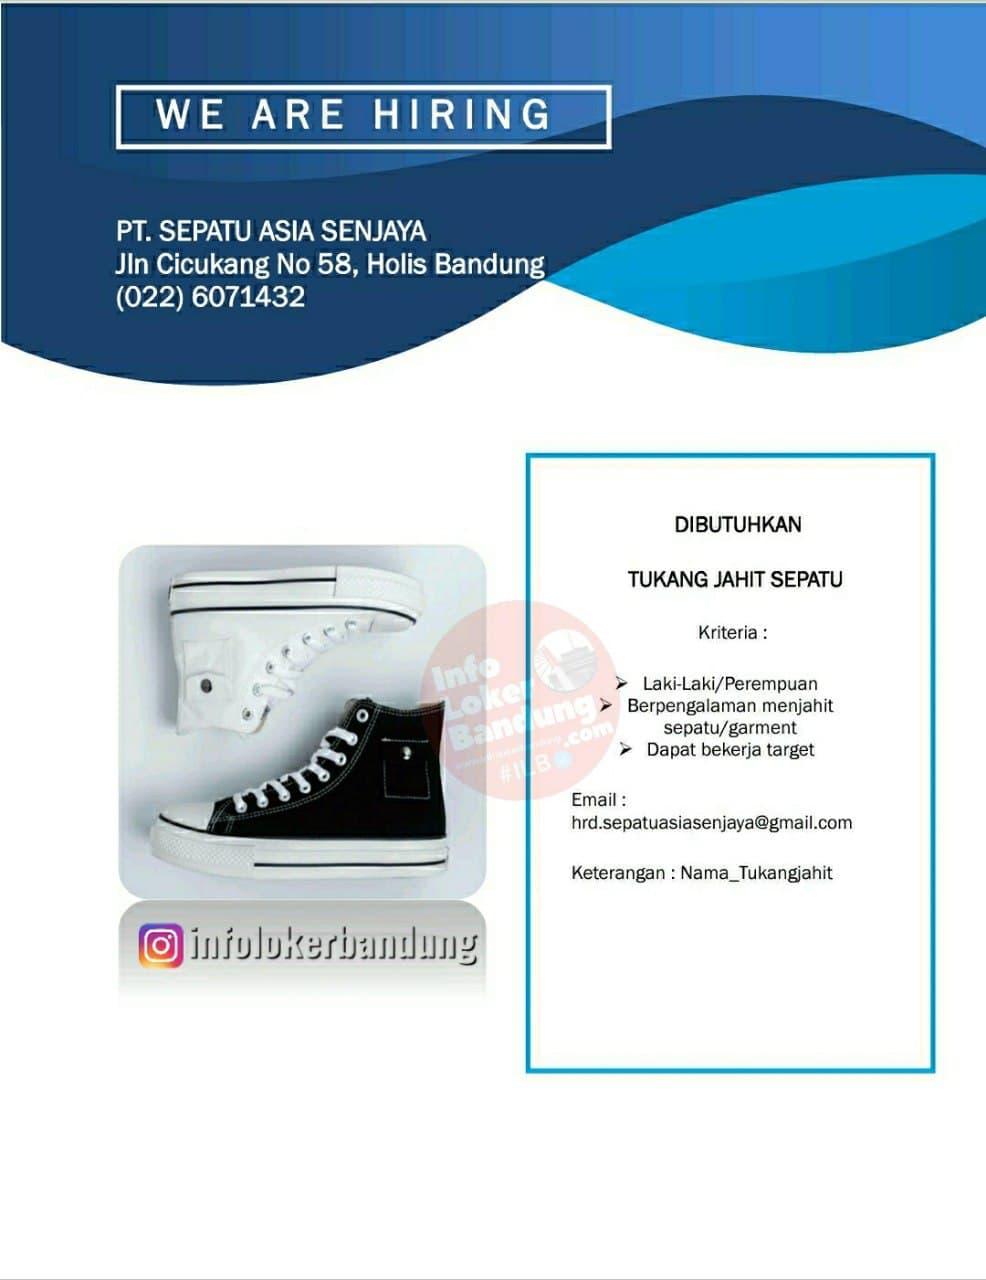 Lowongan Kerja PT. Sepatu Asia Senjaya Bandung September 2021